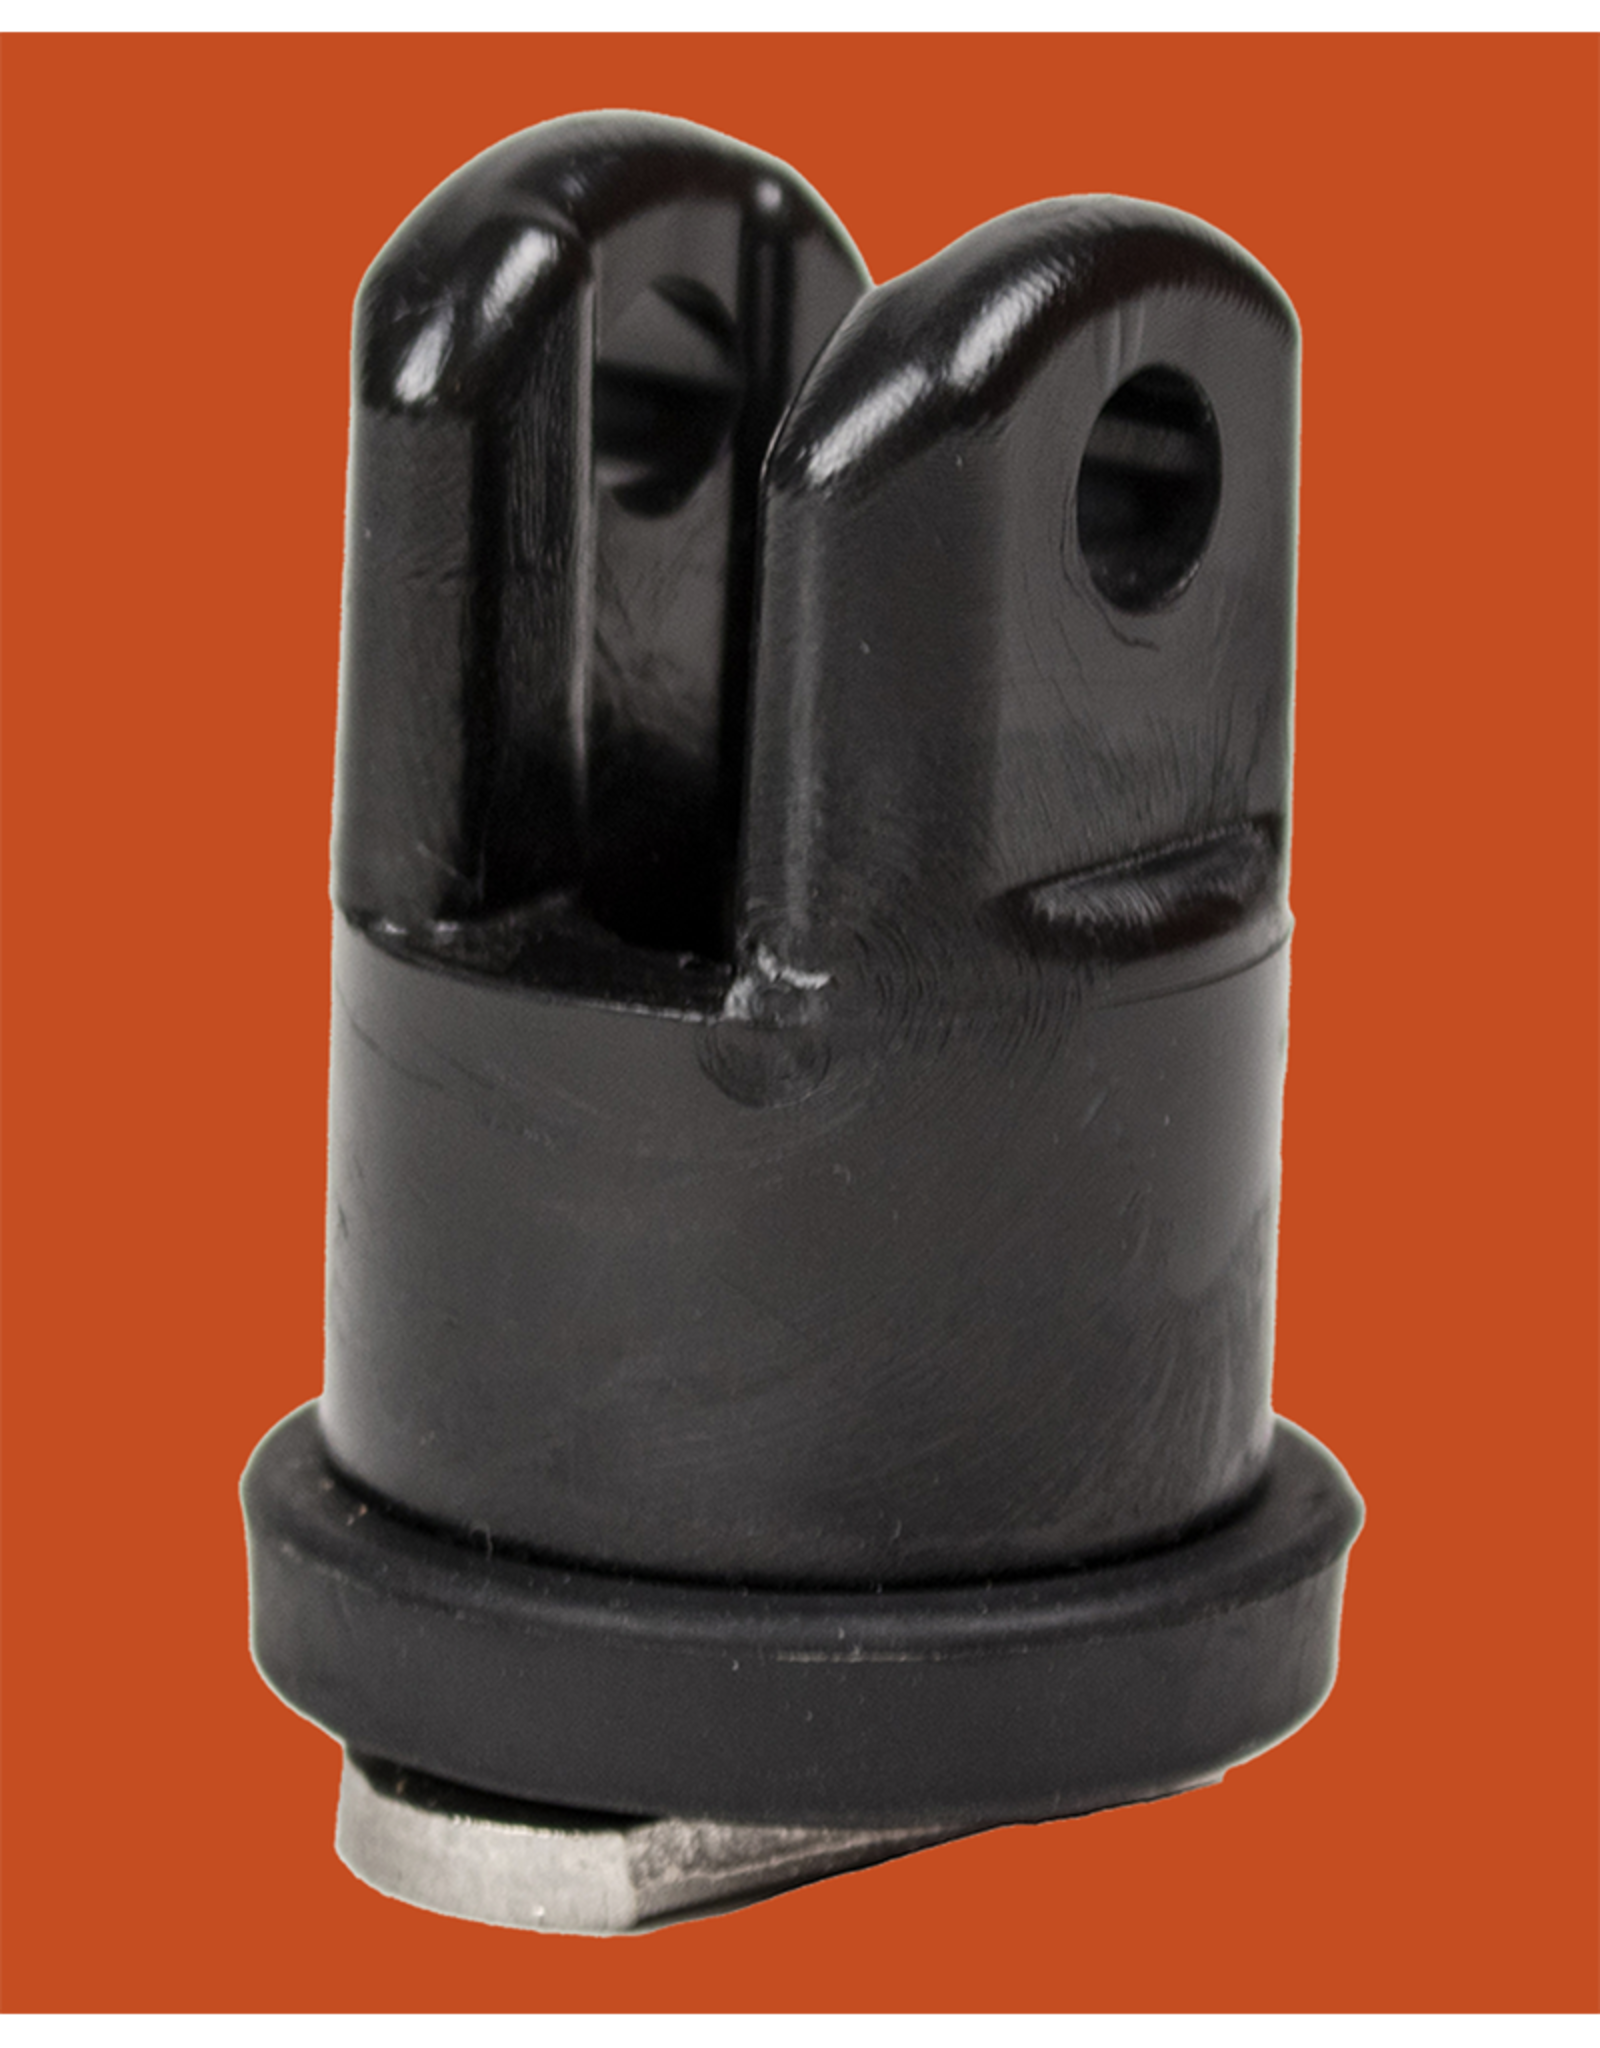 YakAttack CommandStand Track Adapter